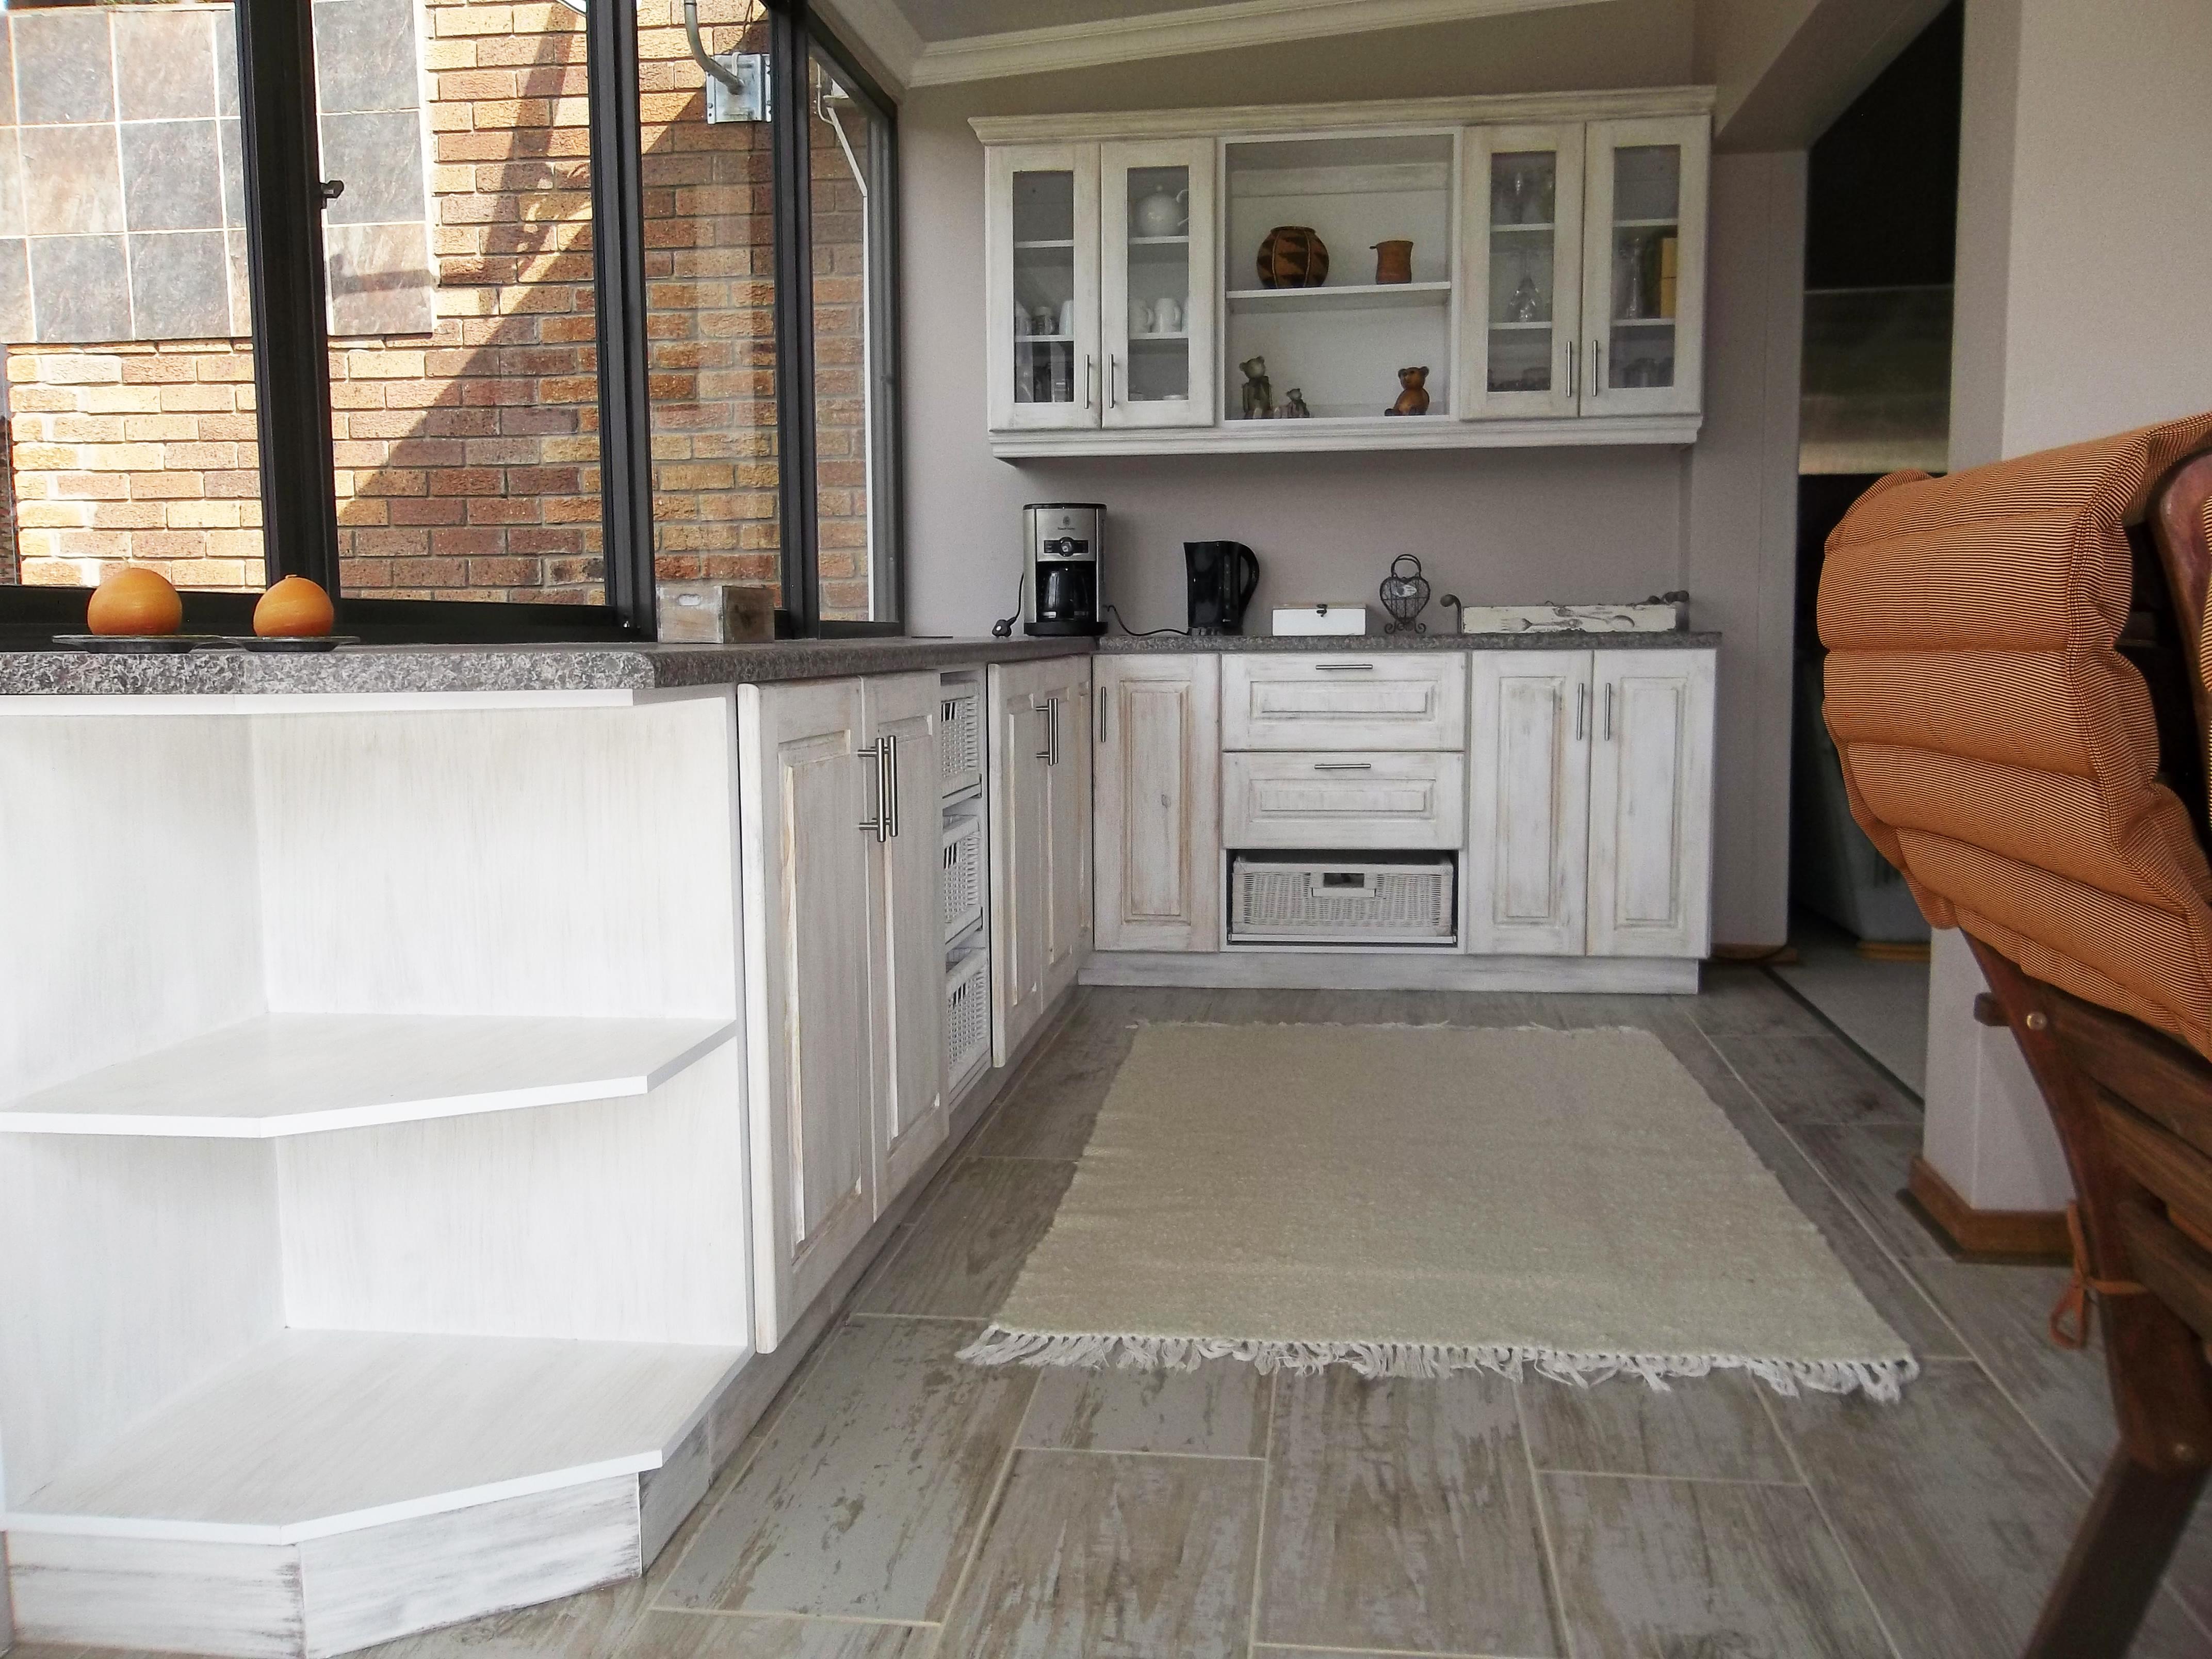 kitchen renovations extreme kitchens wrap doors a kitchen renovated by extreme kitchens